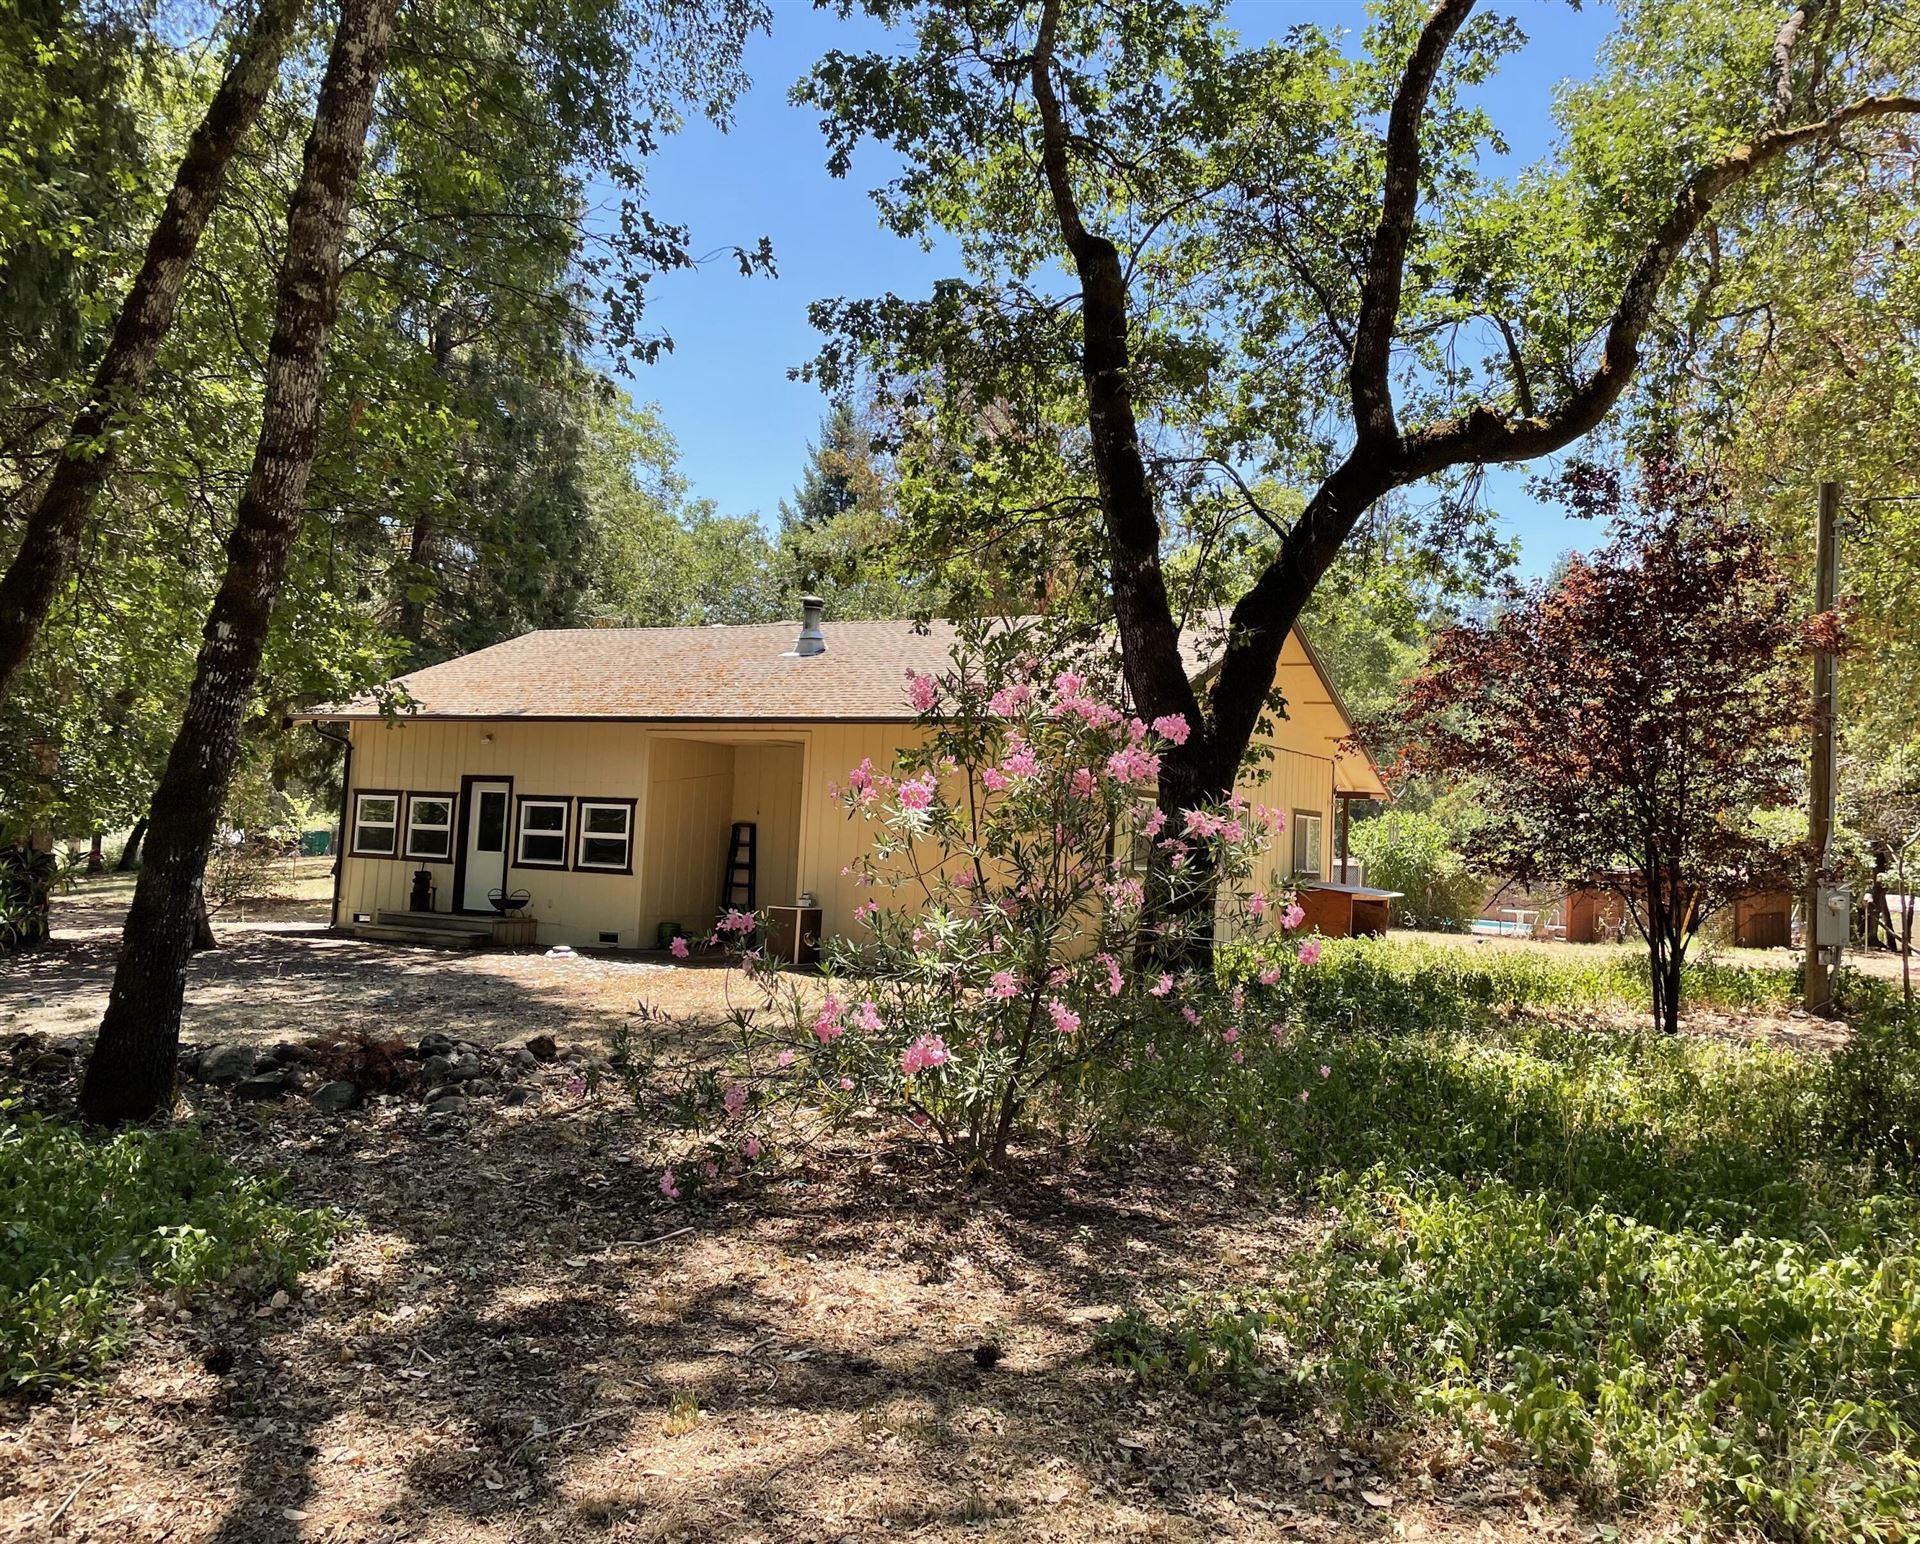 142 Oak Lane, Willow Creek, CA 95573 - MLS#: 259090